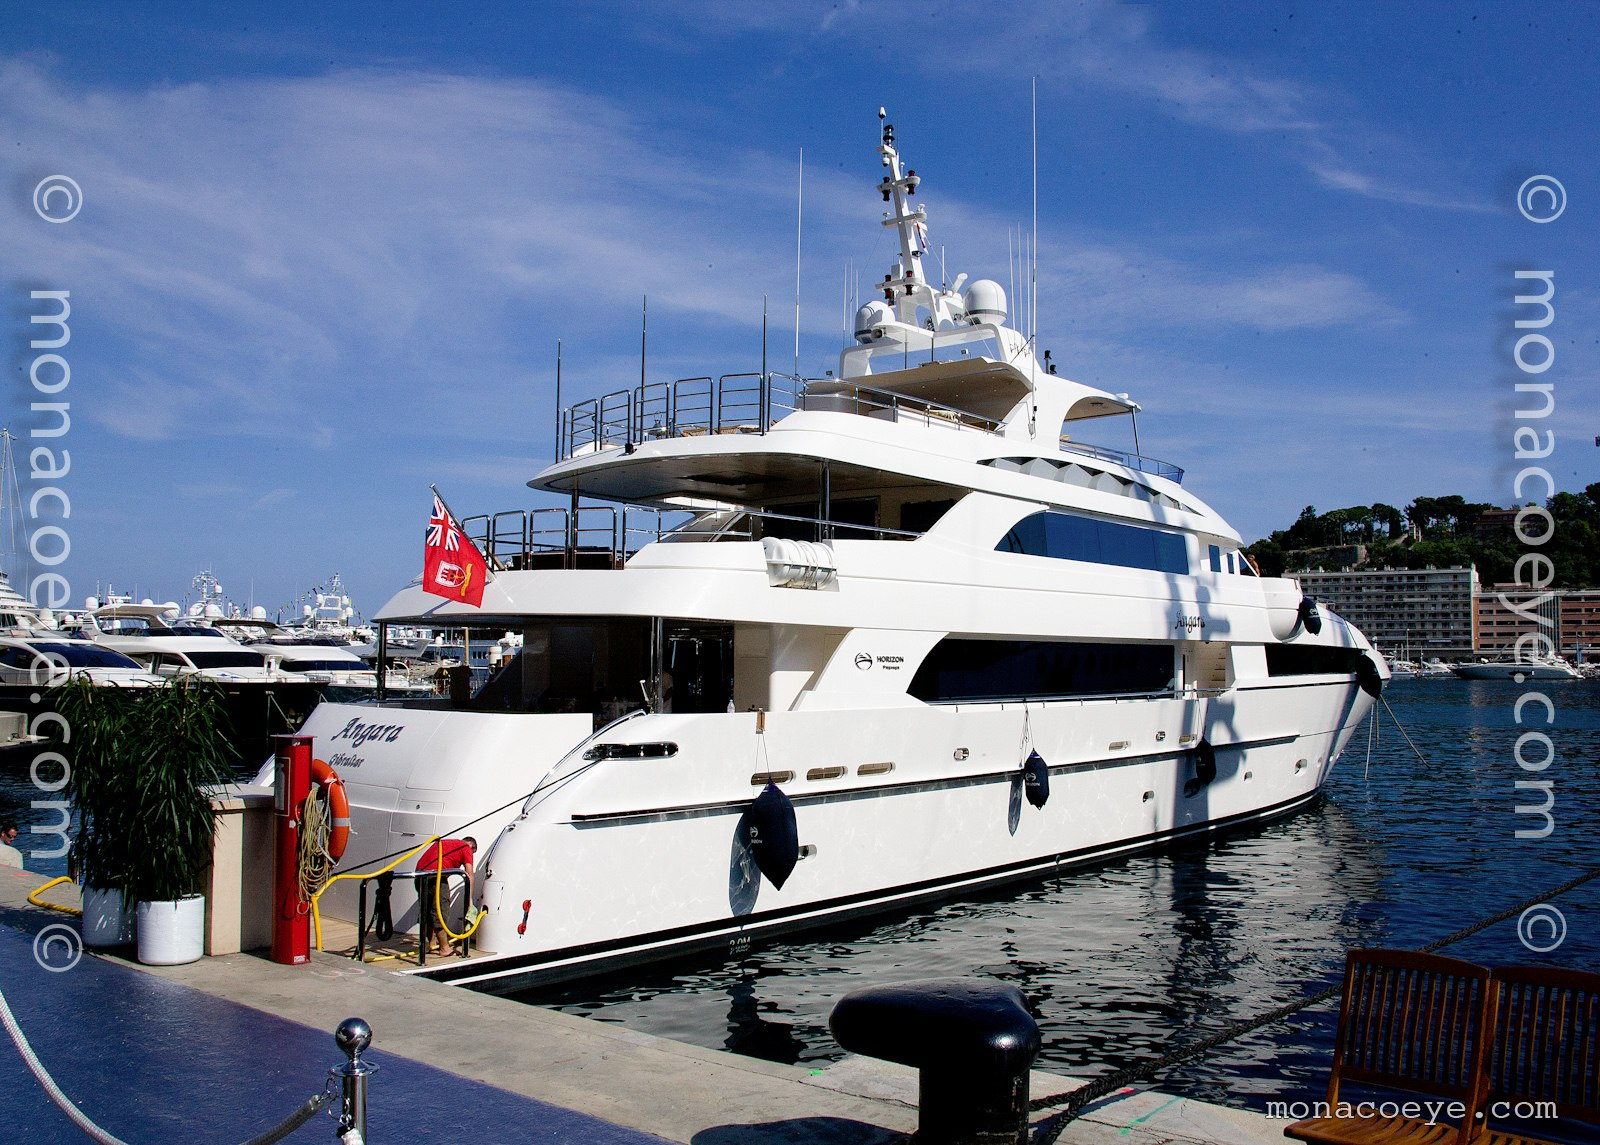 Angara, 2011 design from Horizon Yachts, Greg Marshall and Espinosa Design